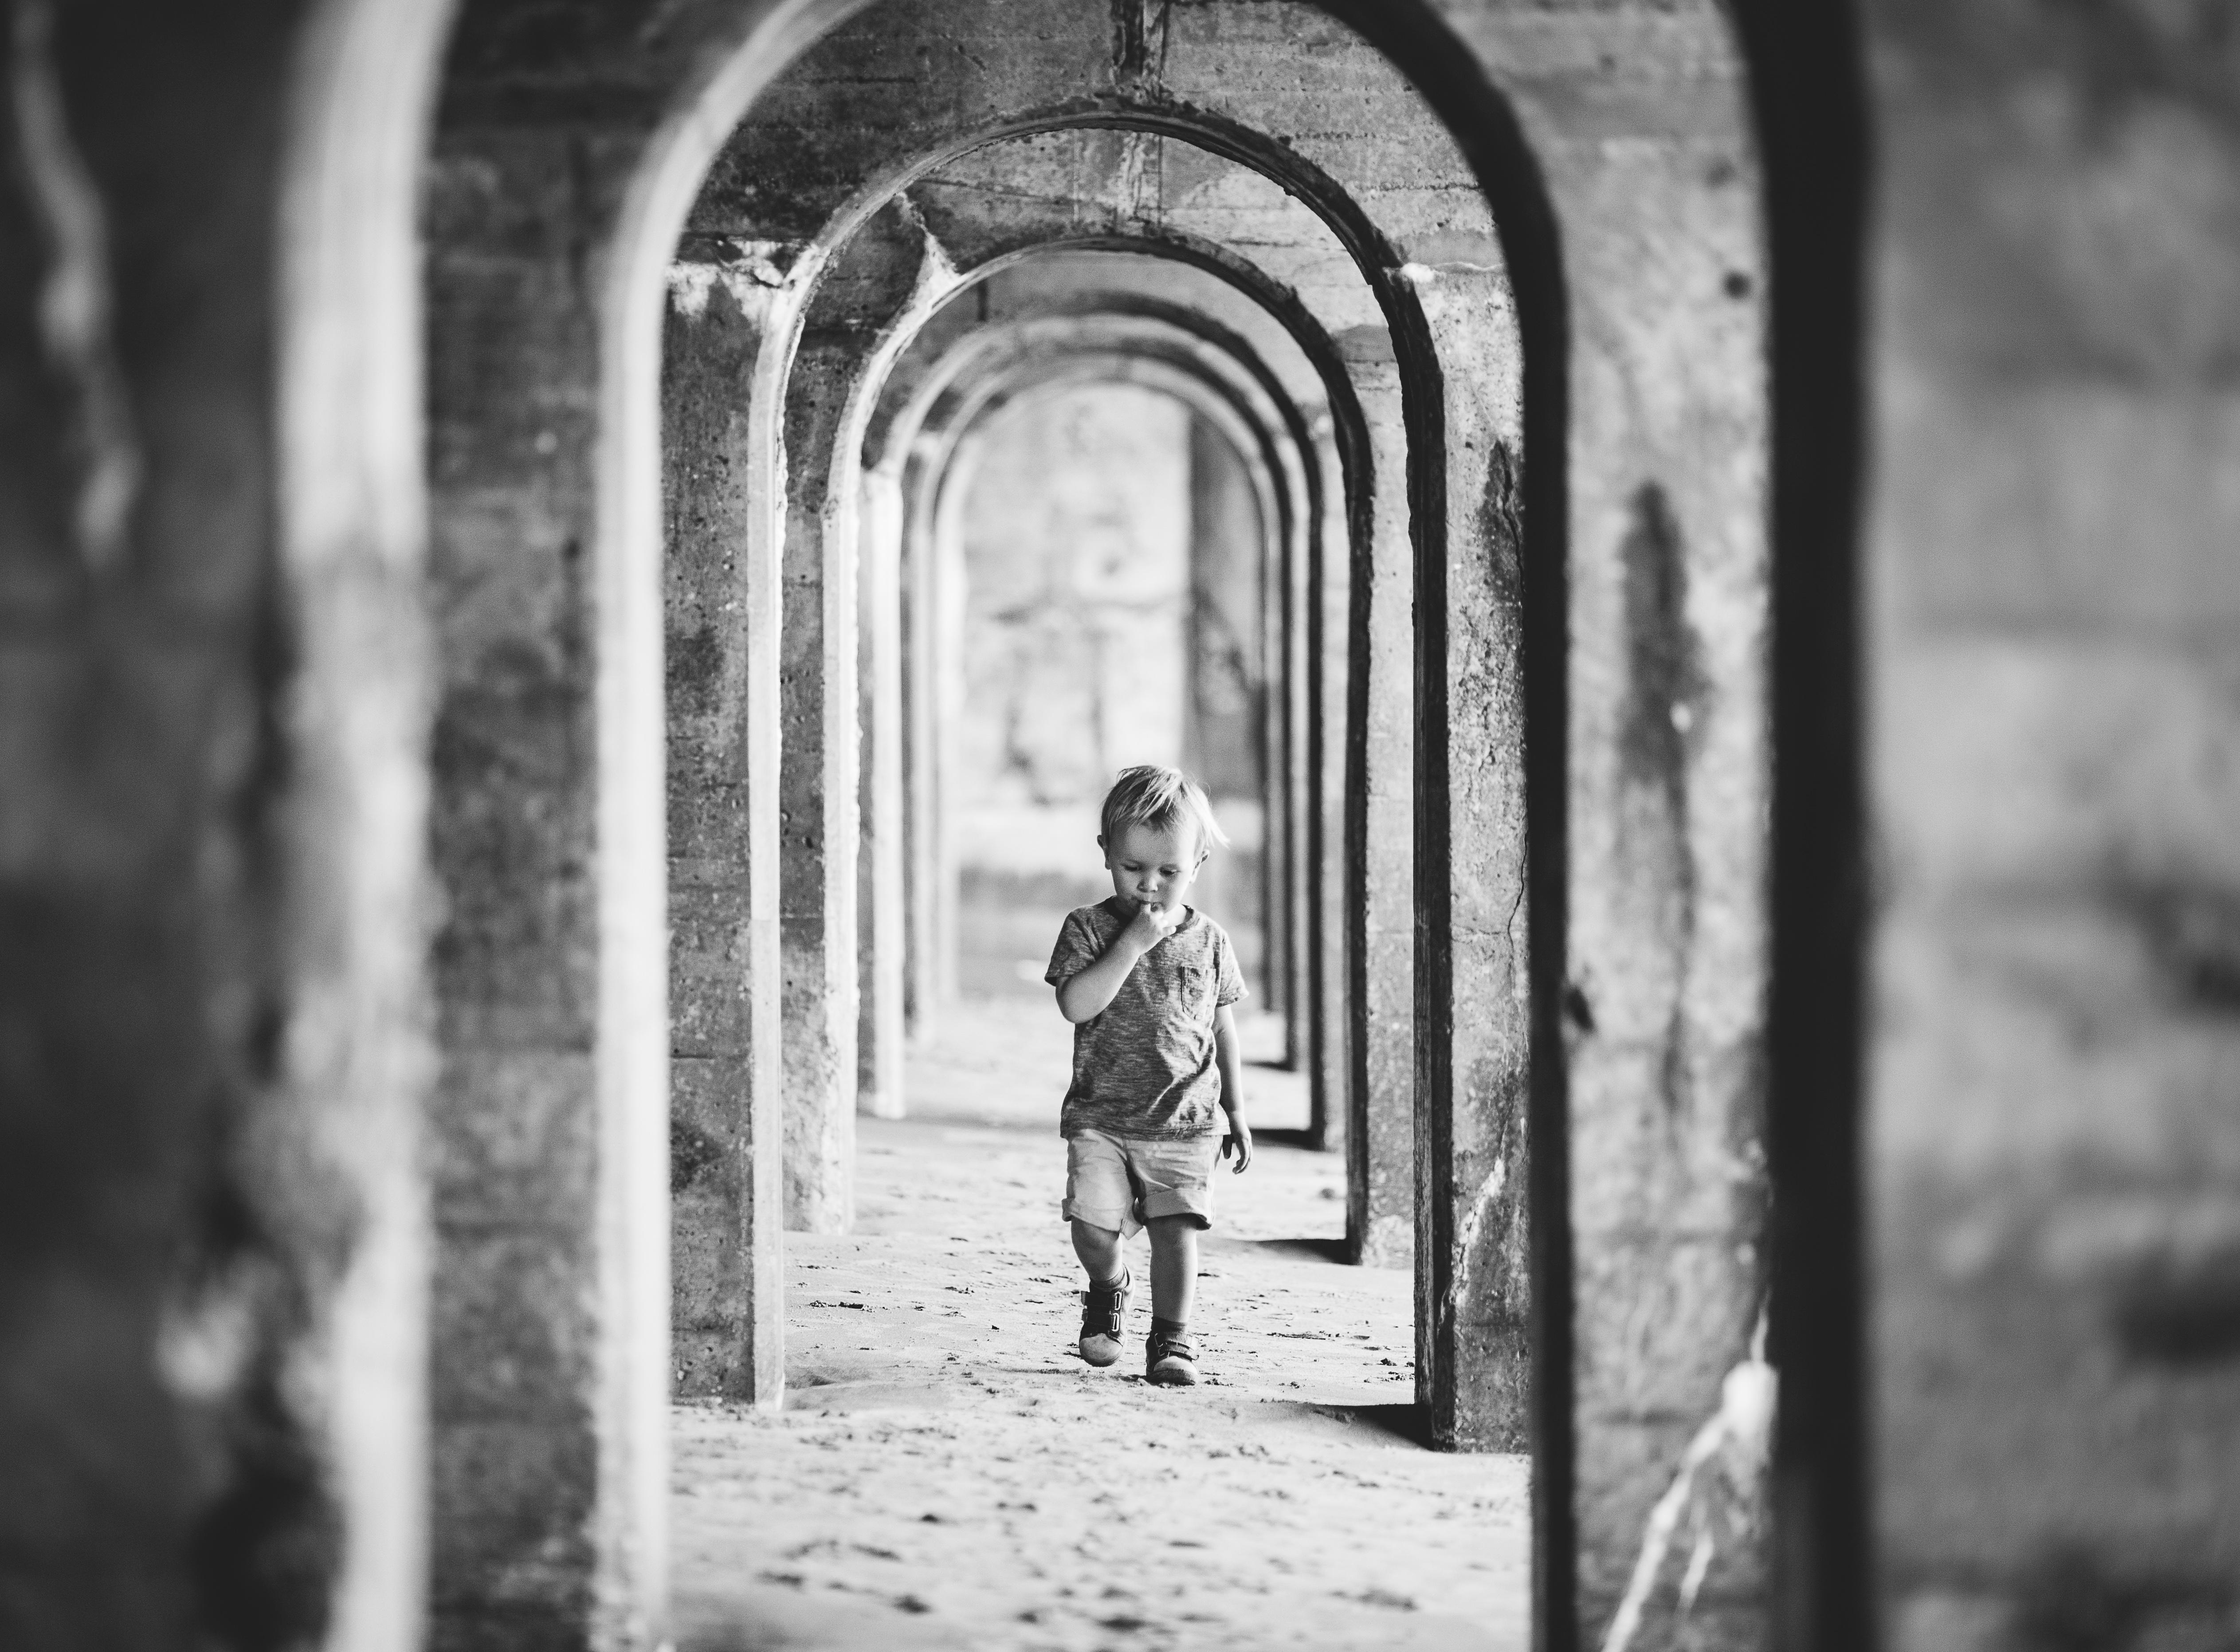 LITTLE BOY IN ARCHES SUNNY SANDS BEACH FOLKESTONE